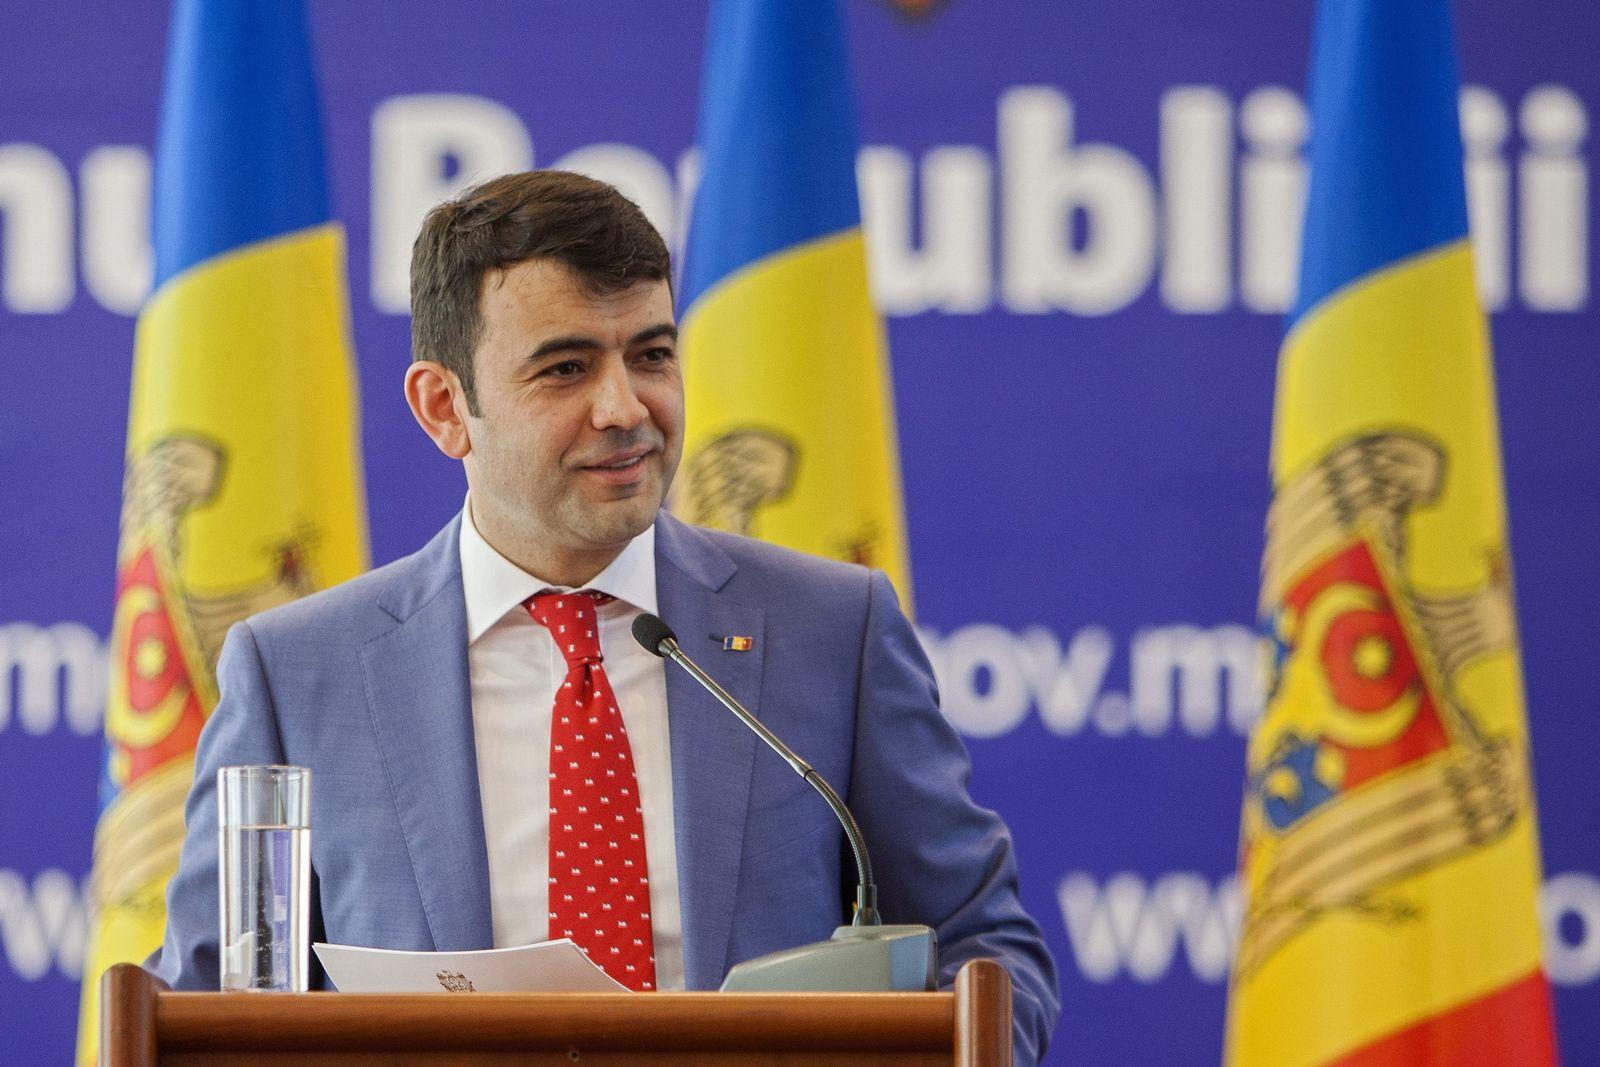 The Prime Minister of Moldova Chiril Gaburici announced his resig